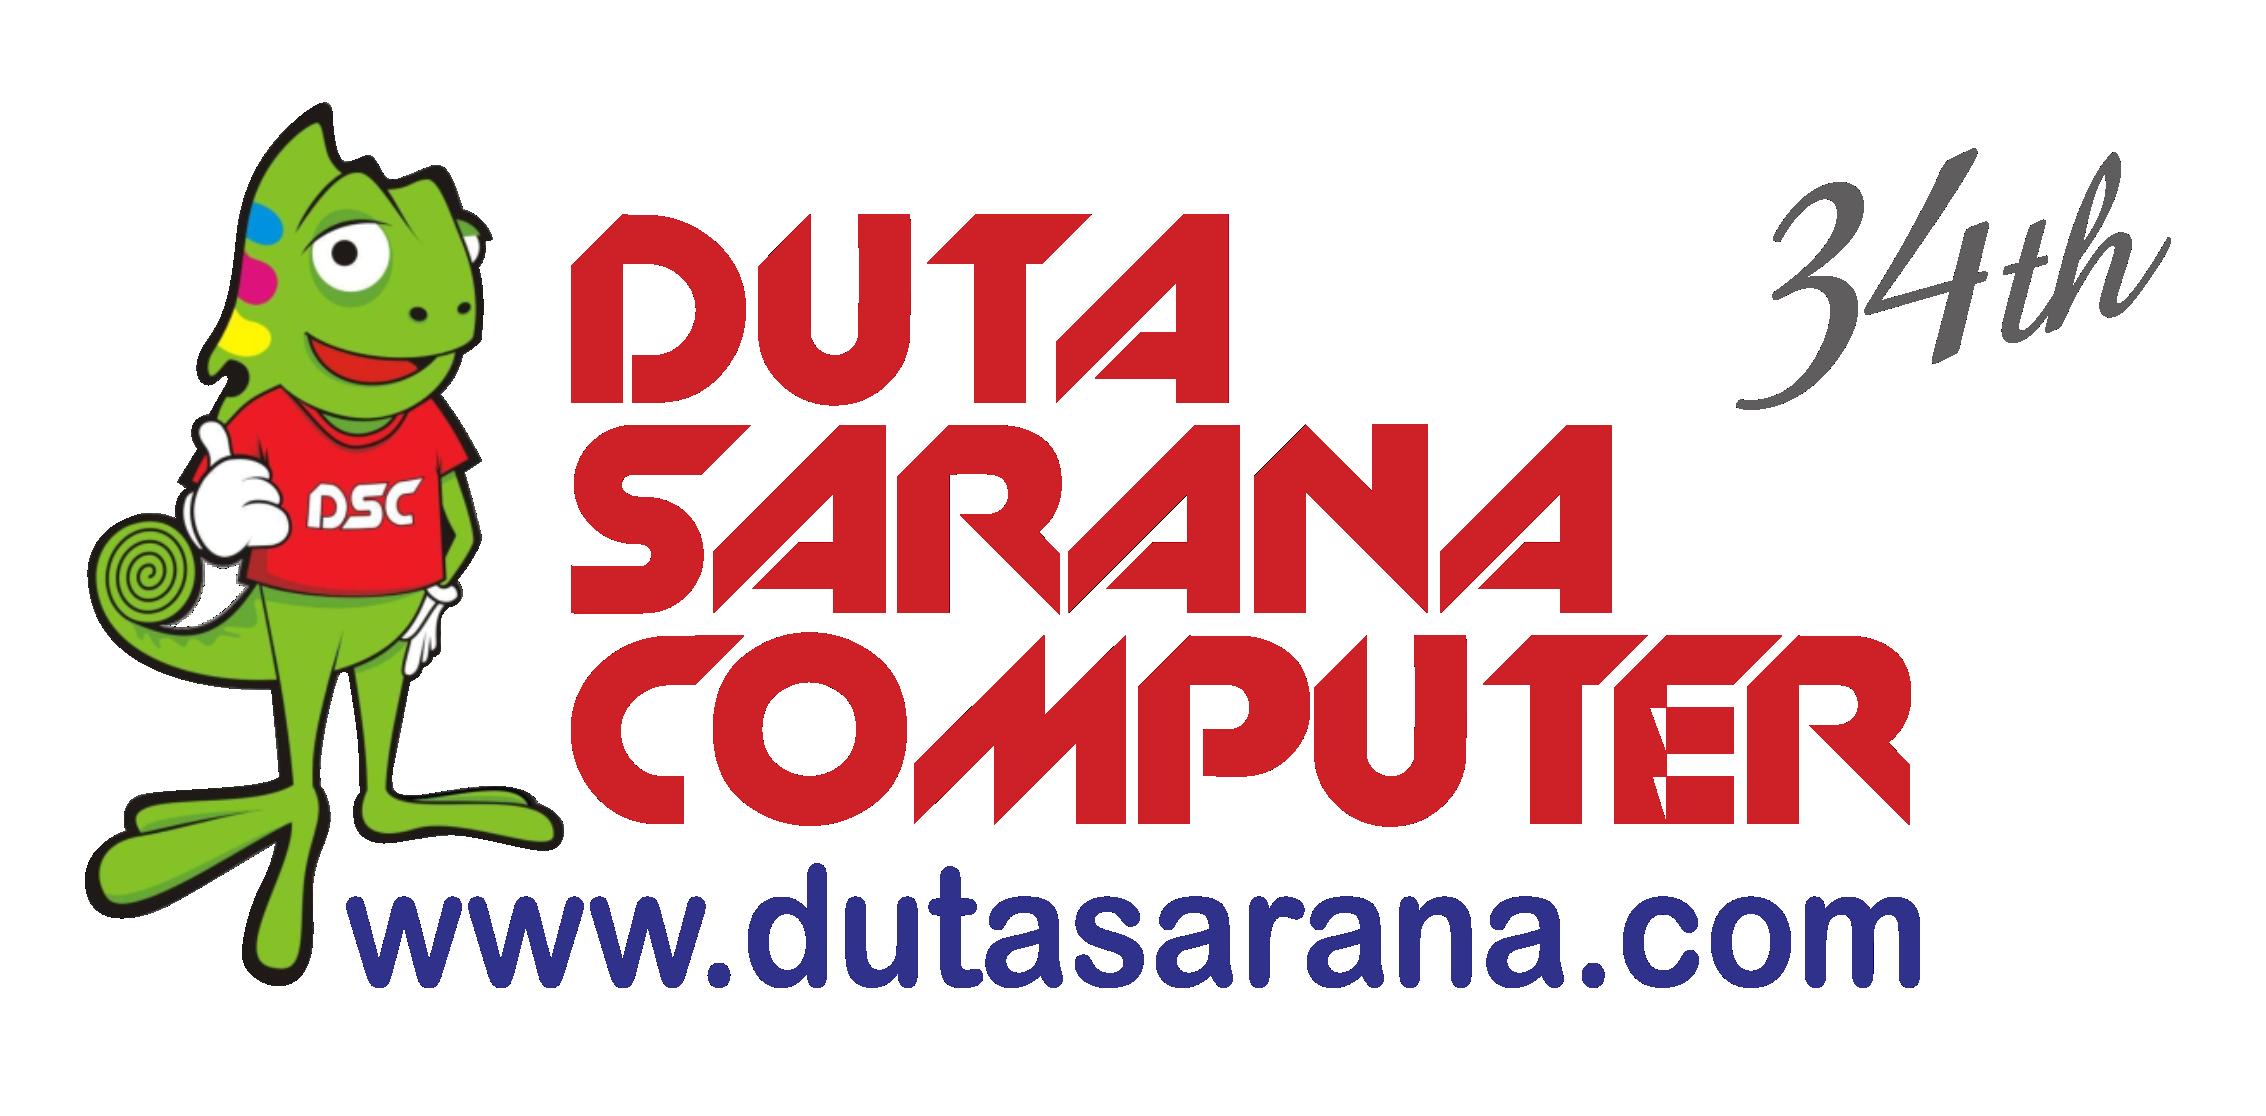 Duta Sarana Computer